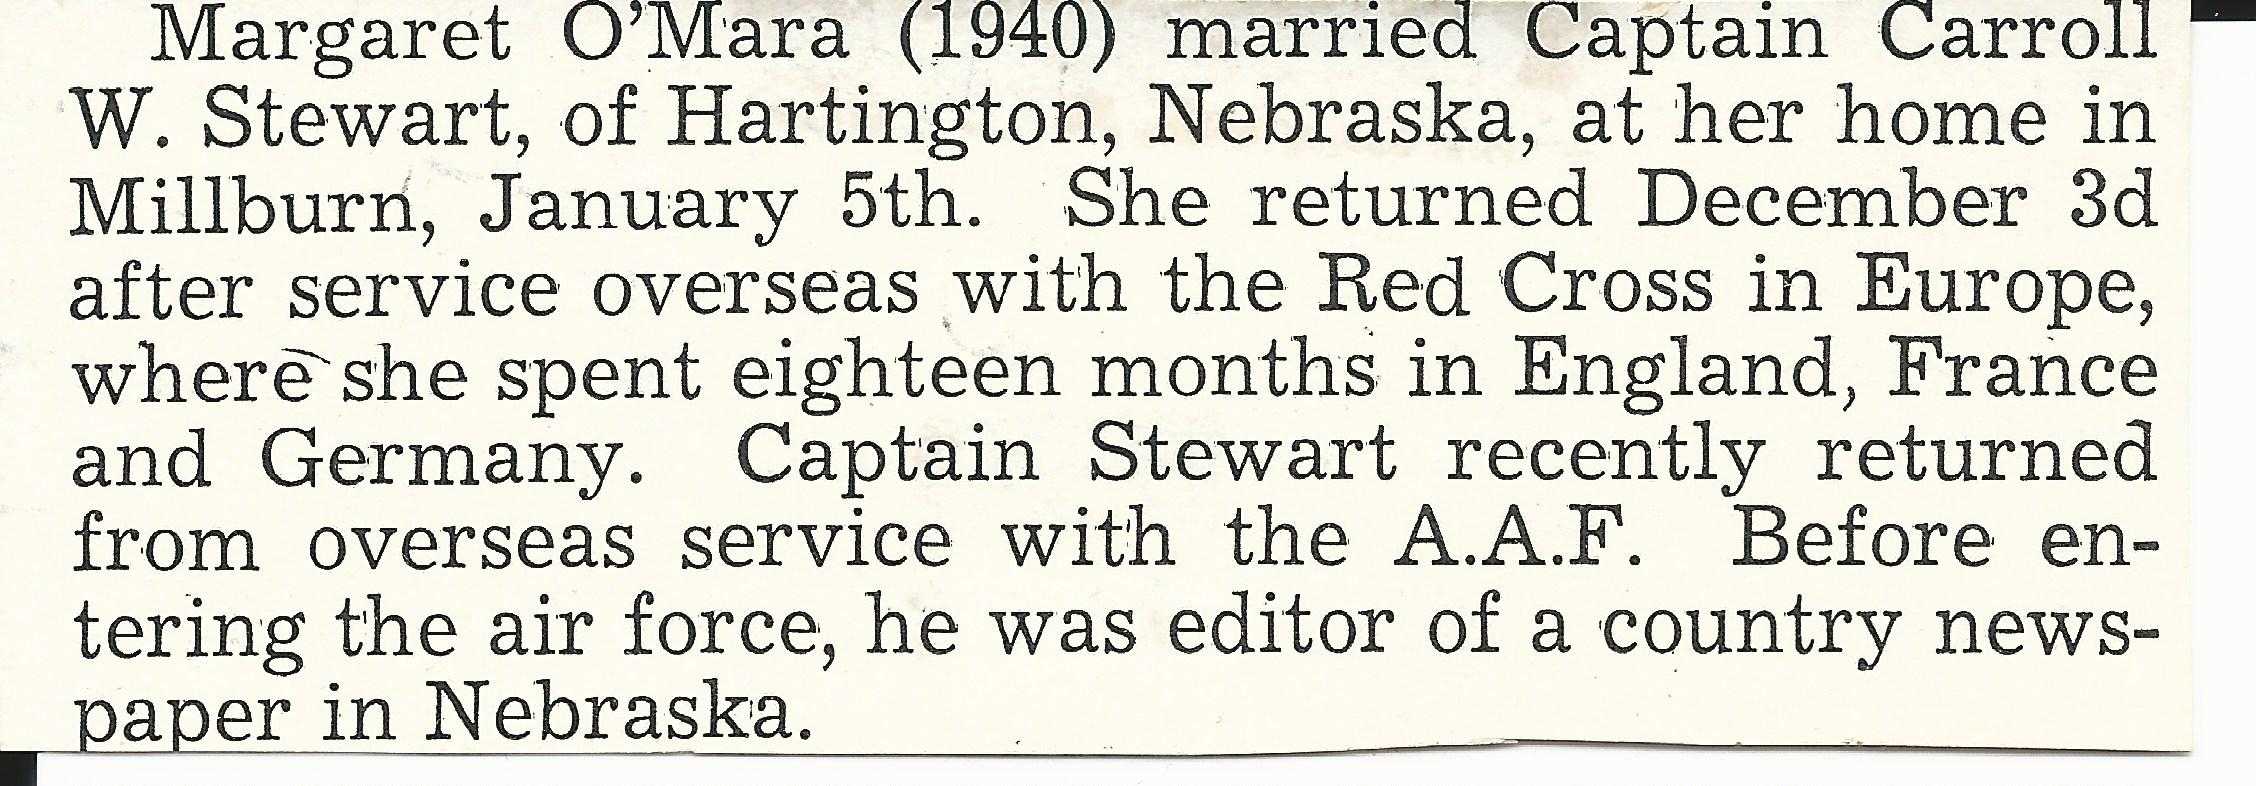 Margaret O'Mara Servicemen's News February 1946 (Incomplete)